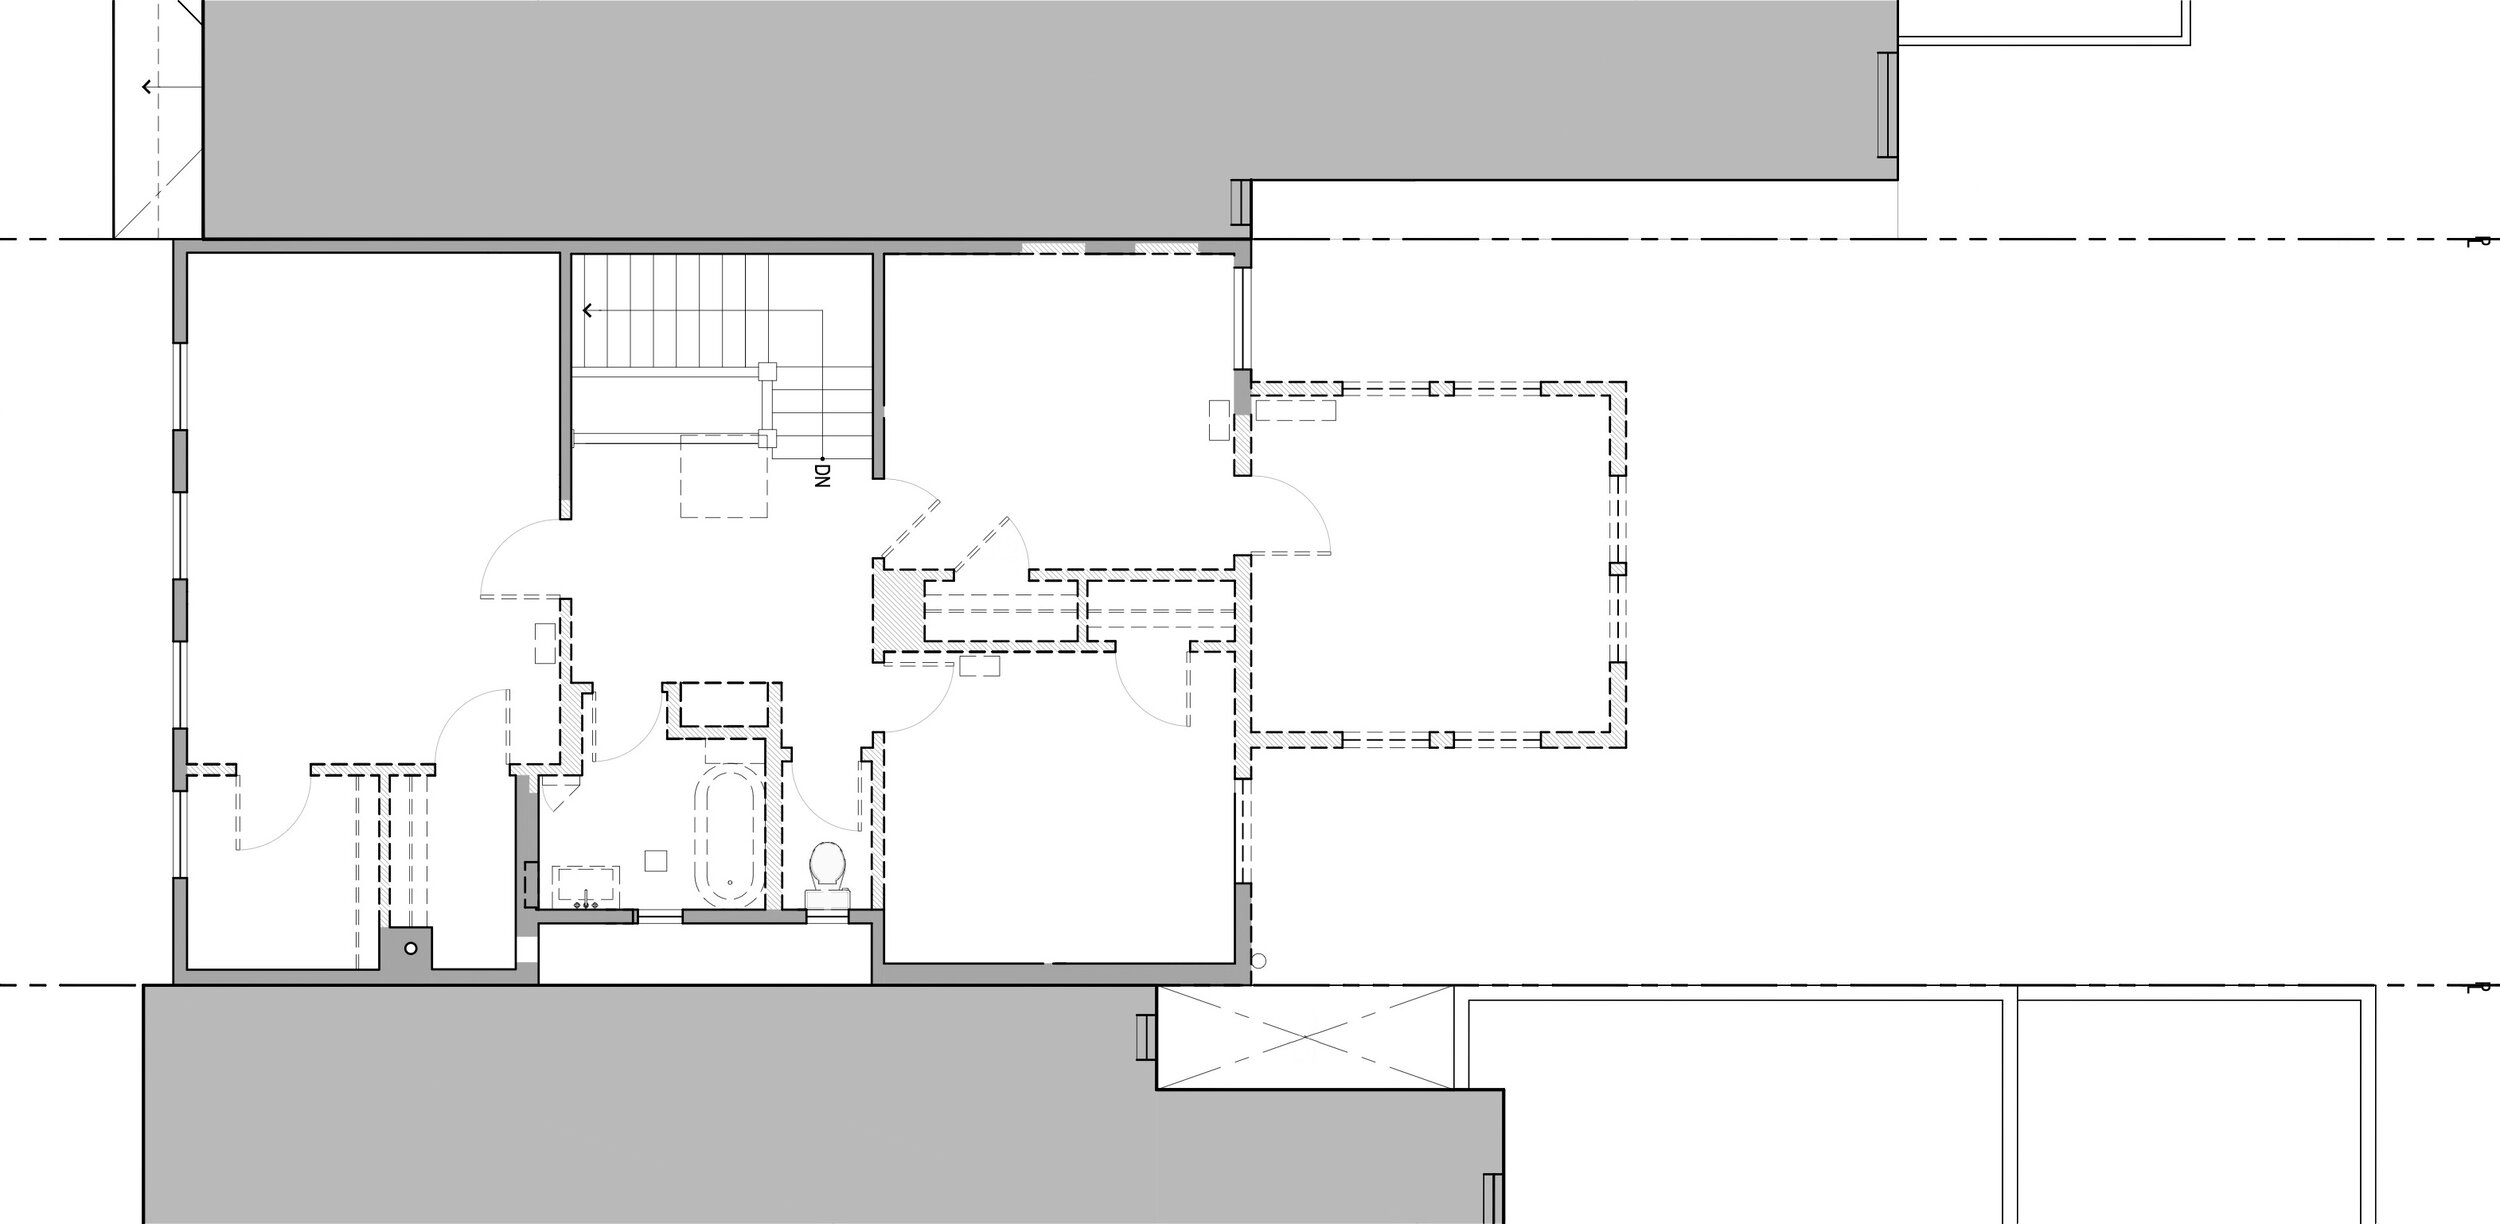 2017-03-23 535 15th Ave Construction Set A103 v2.jpg